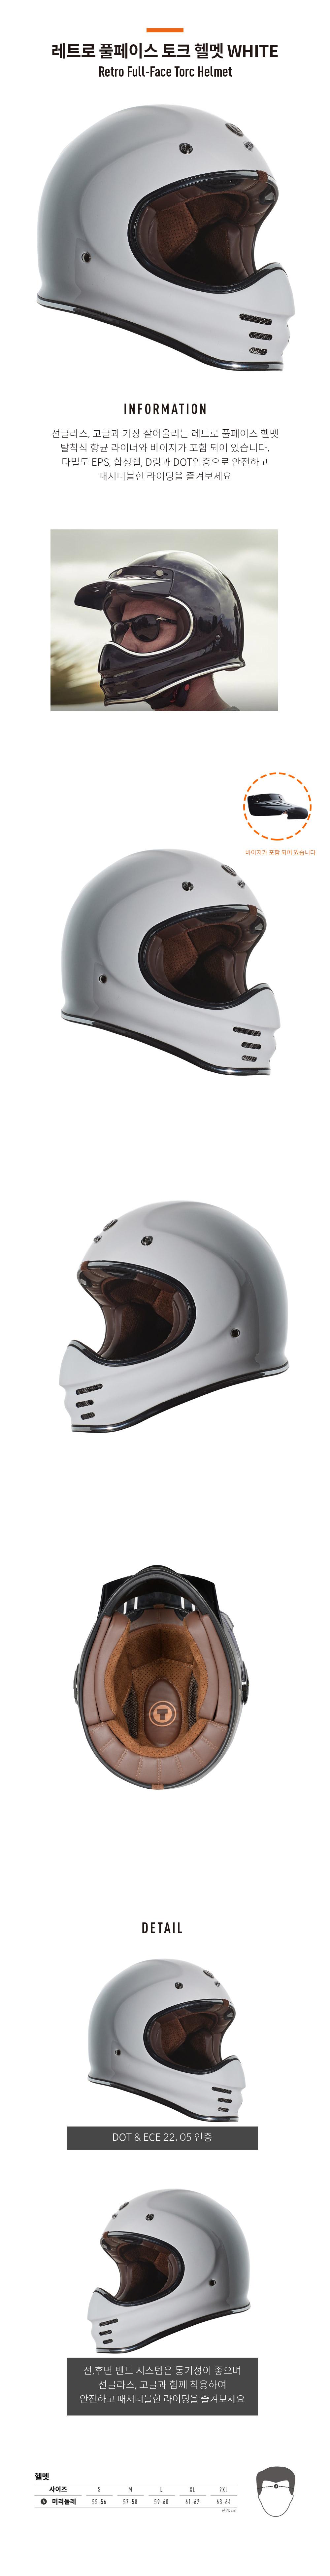 Torc 레트로 풀페이스 토크 헬멧 WHITE